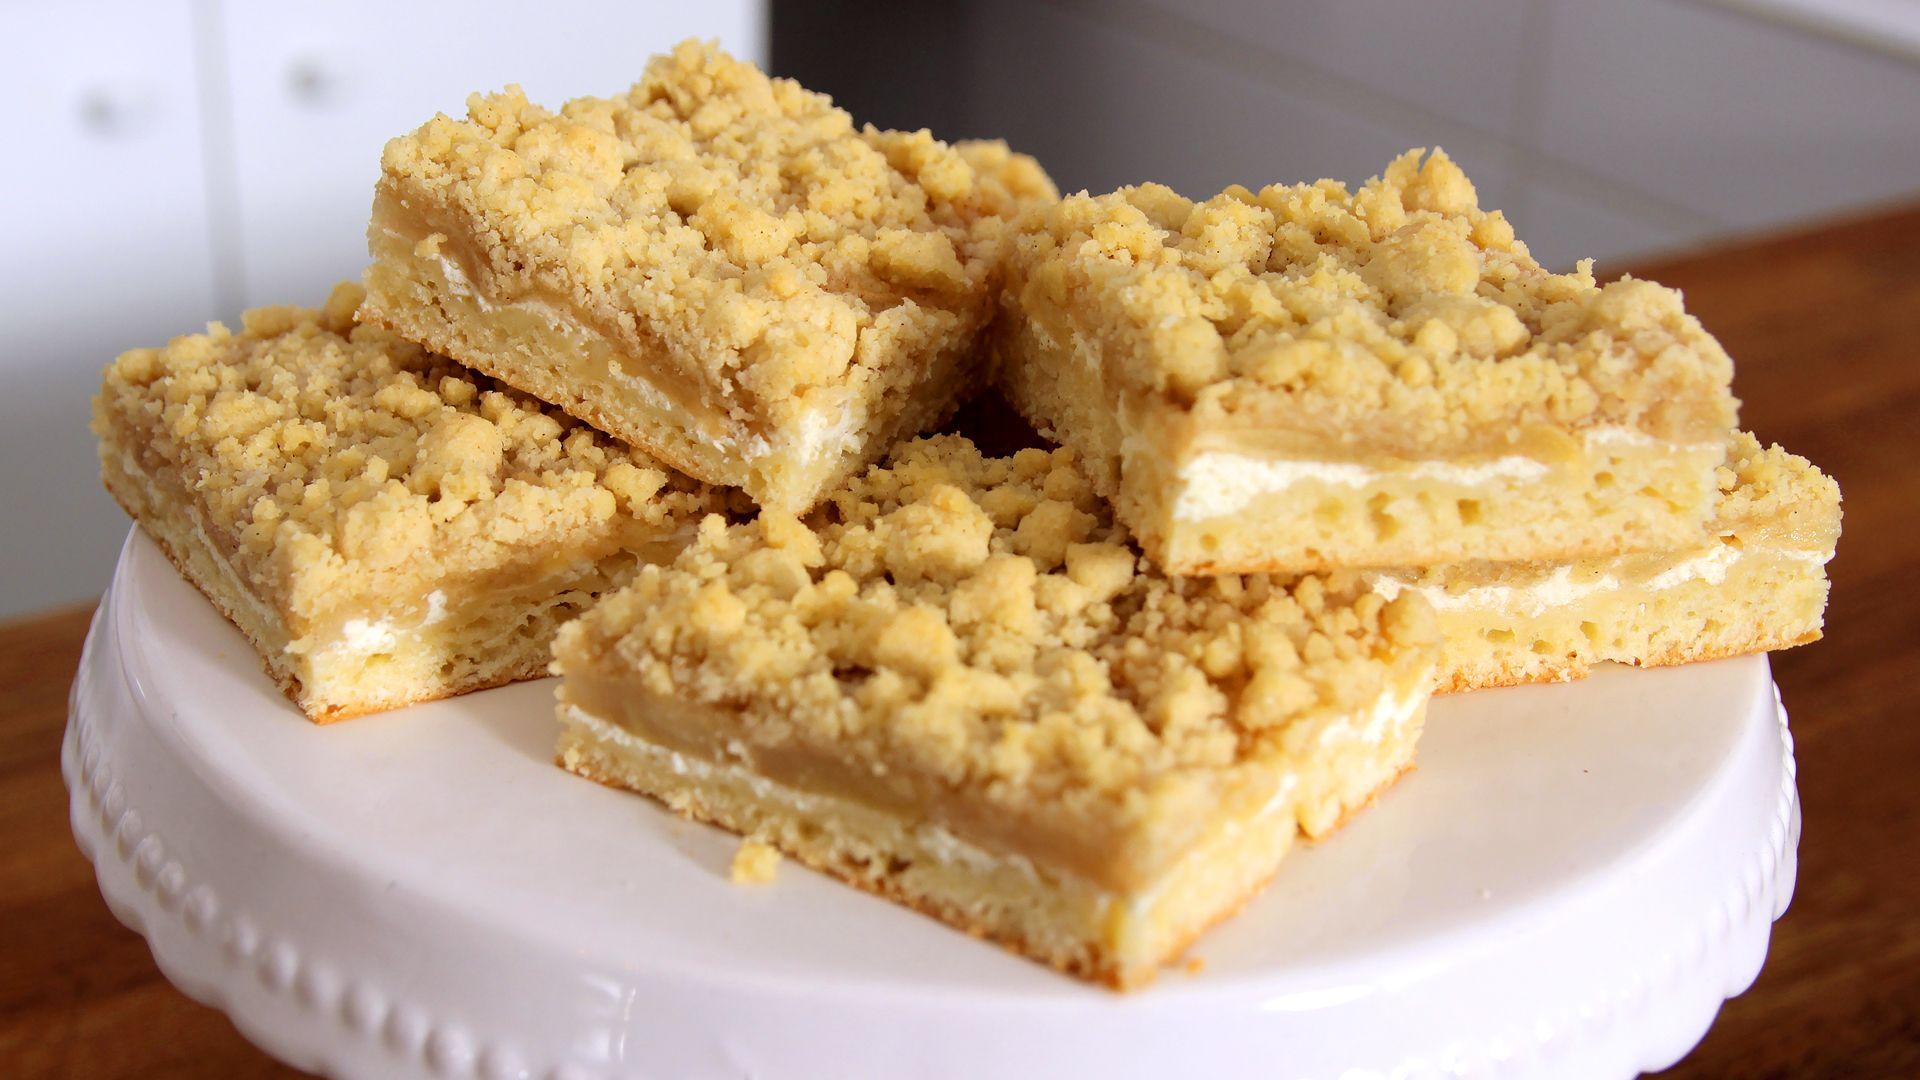 Saftiger Apfel-Streuselkuchen Rezept als Back-Video zum selber machen! Ganz einfach Schritt für Schritt erklärt!